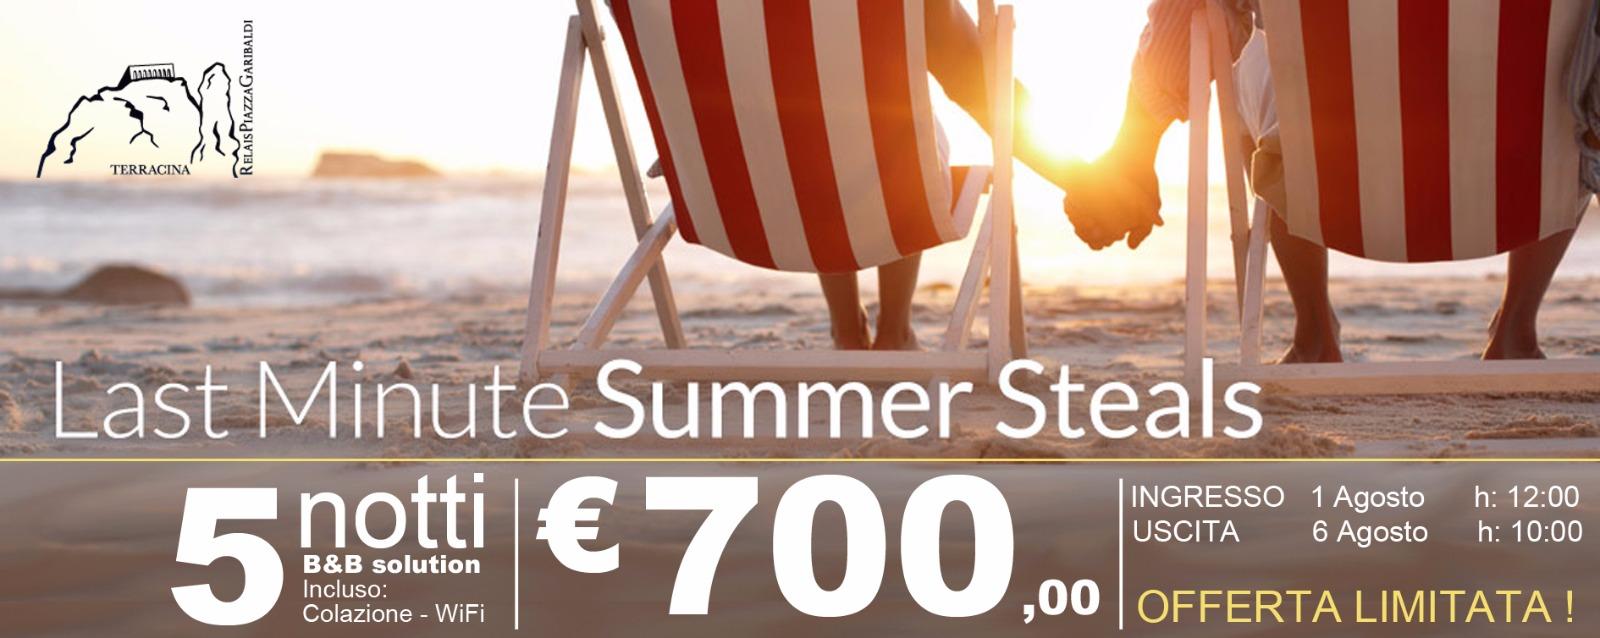 5 notti a 700 euro